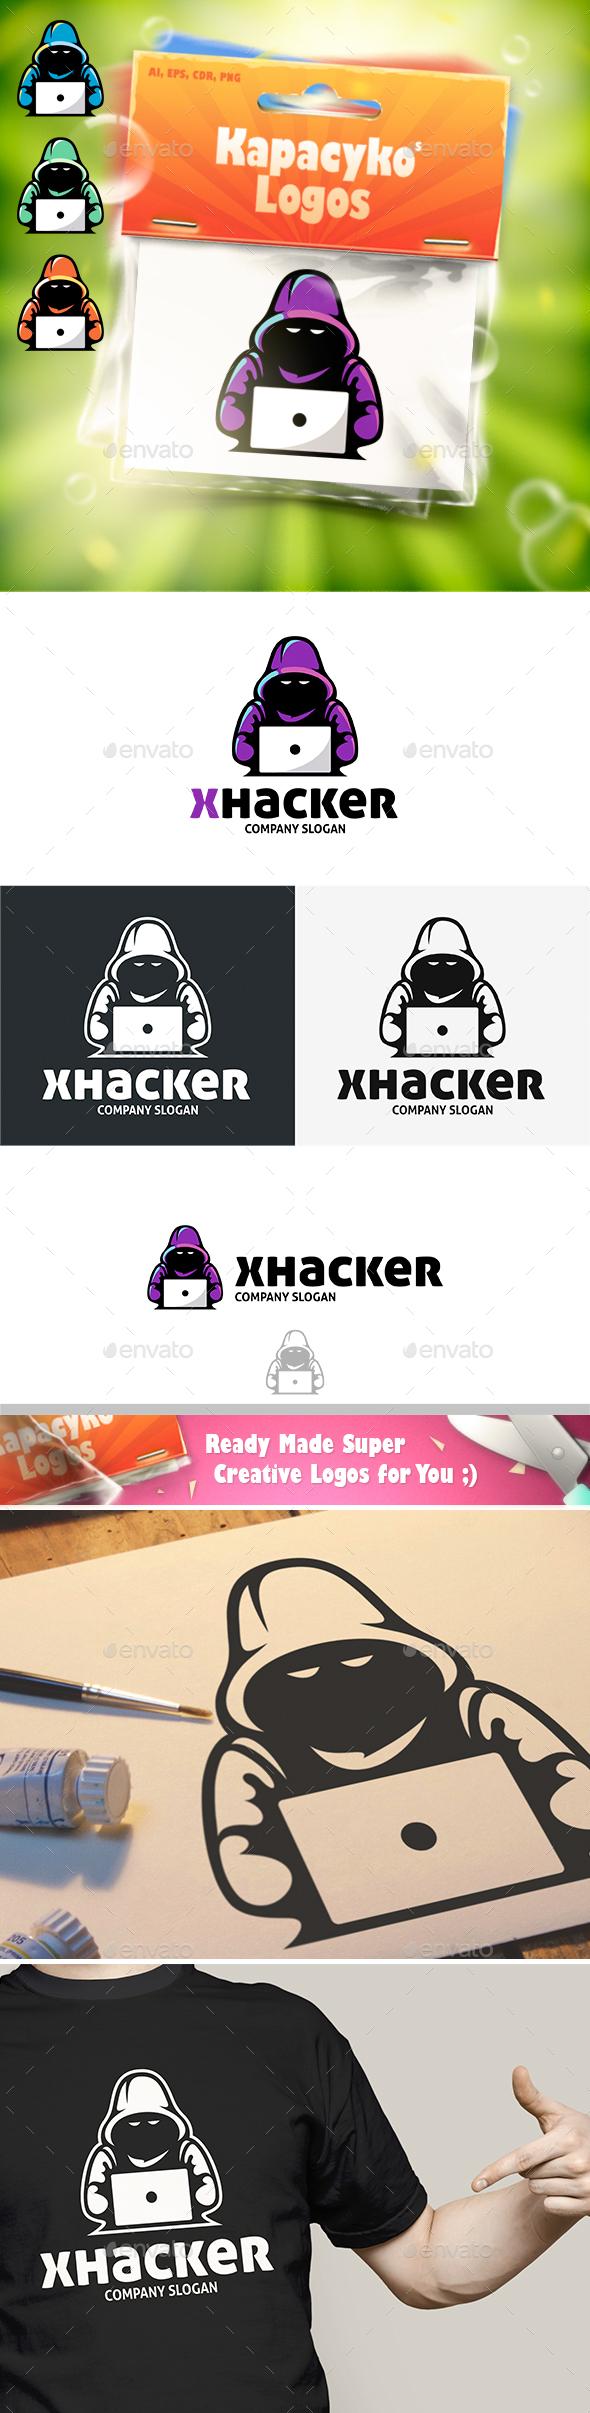 X Hacker Logo